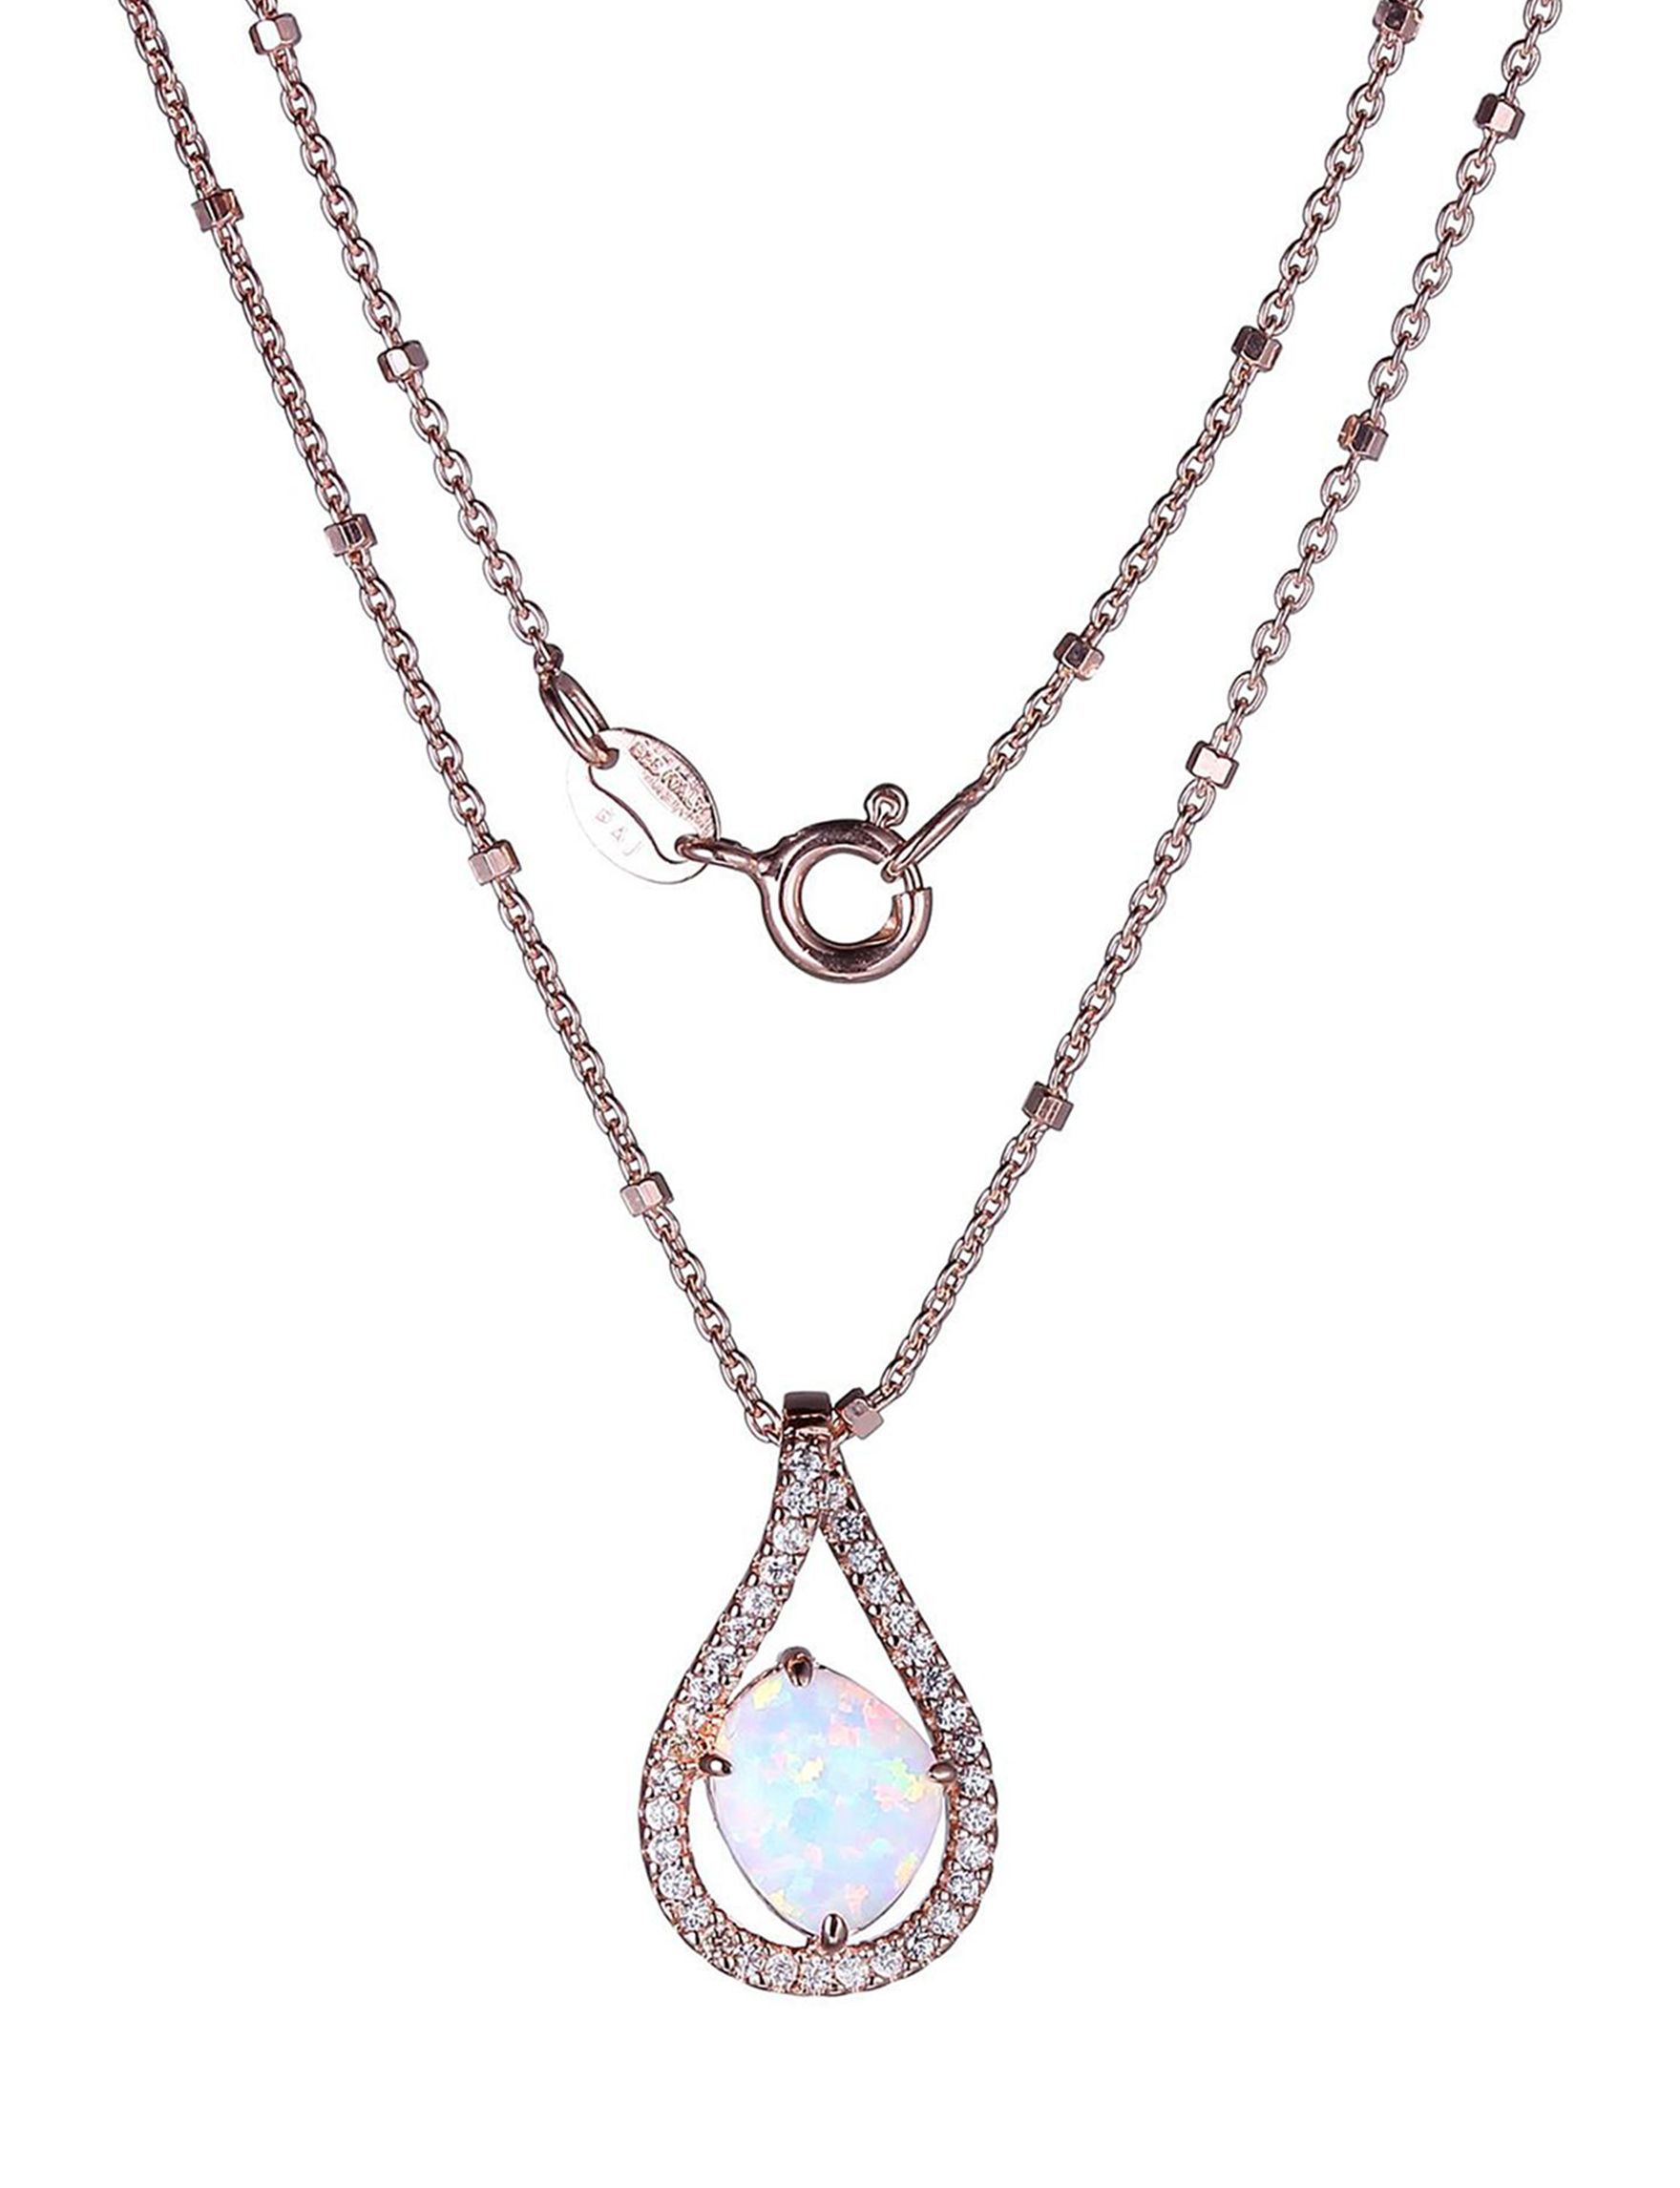 PAJ INC. Silver / Crystal Necklaces & Pendants Fine Jewelry